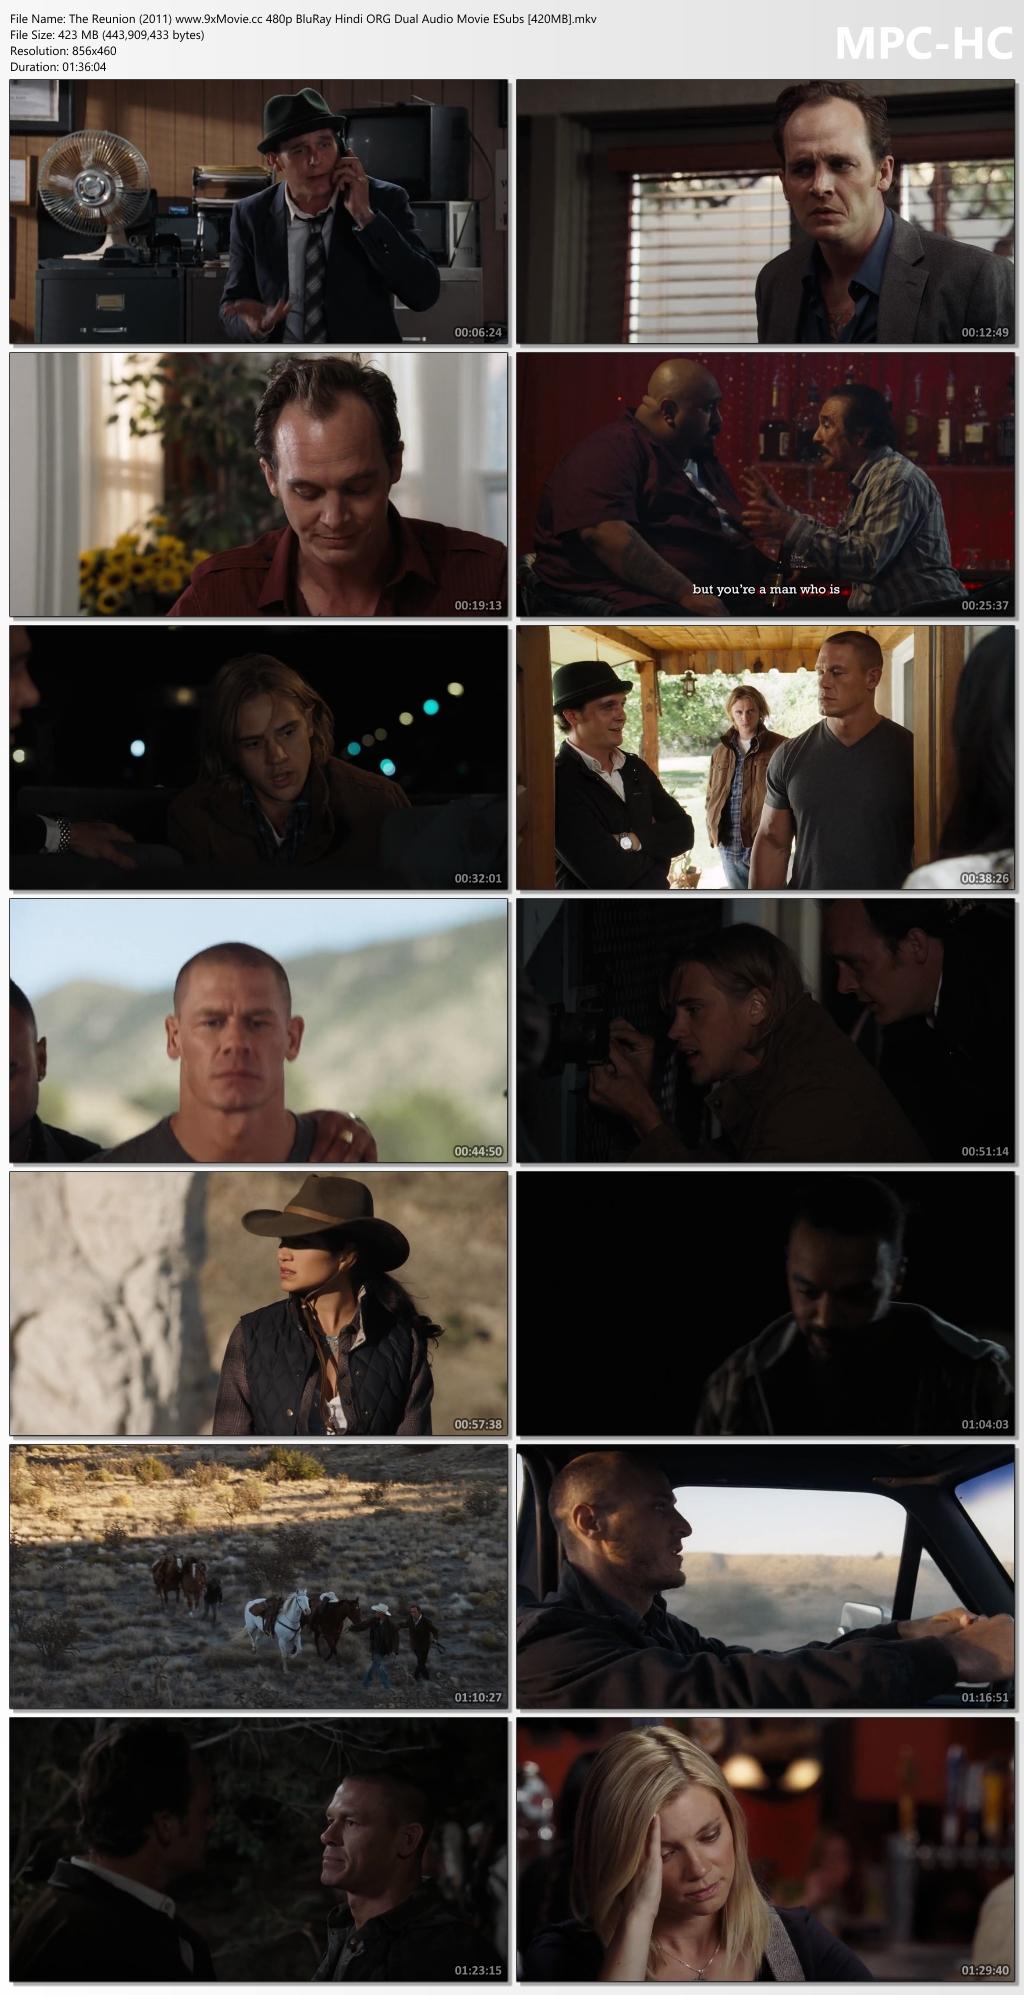 The-Reunion-2011-www-9x-Movie-cc-480p-Blu-Ray-Hindi-ORG-Dual-Audio-Movie-ESubs-420-MB-mkv